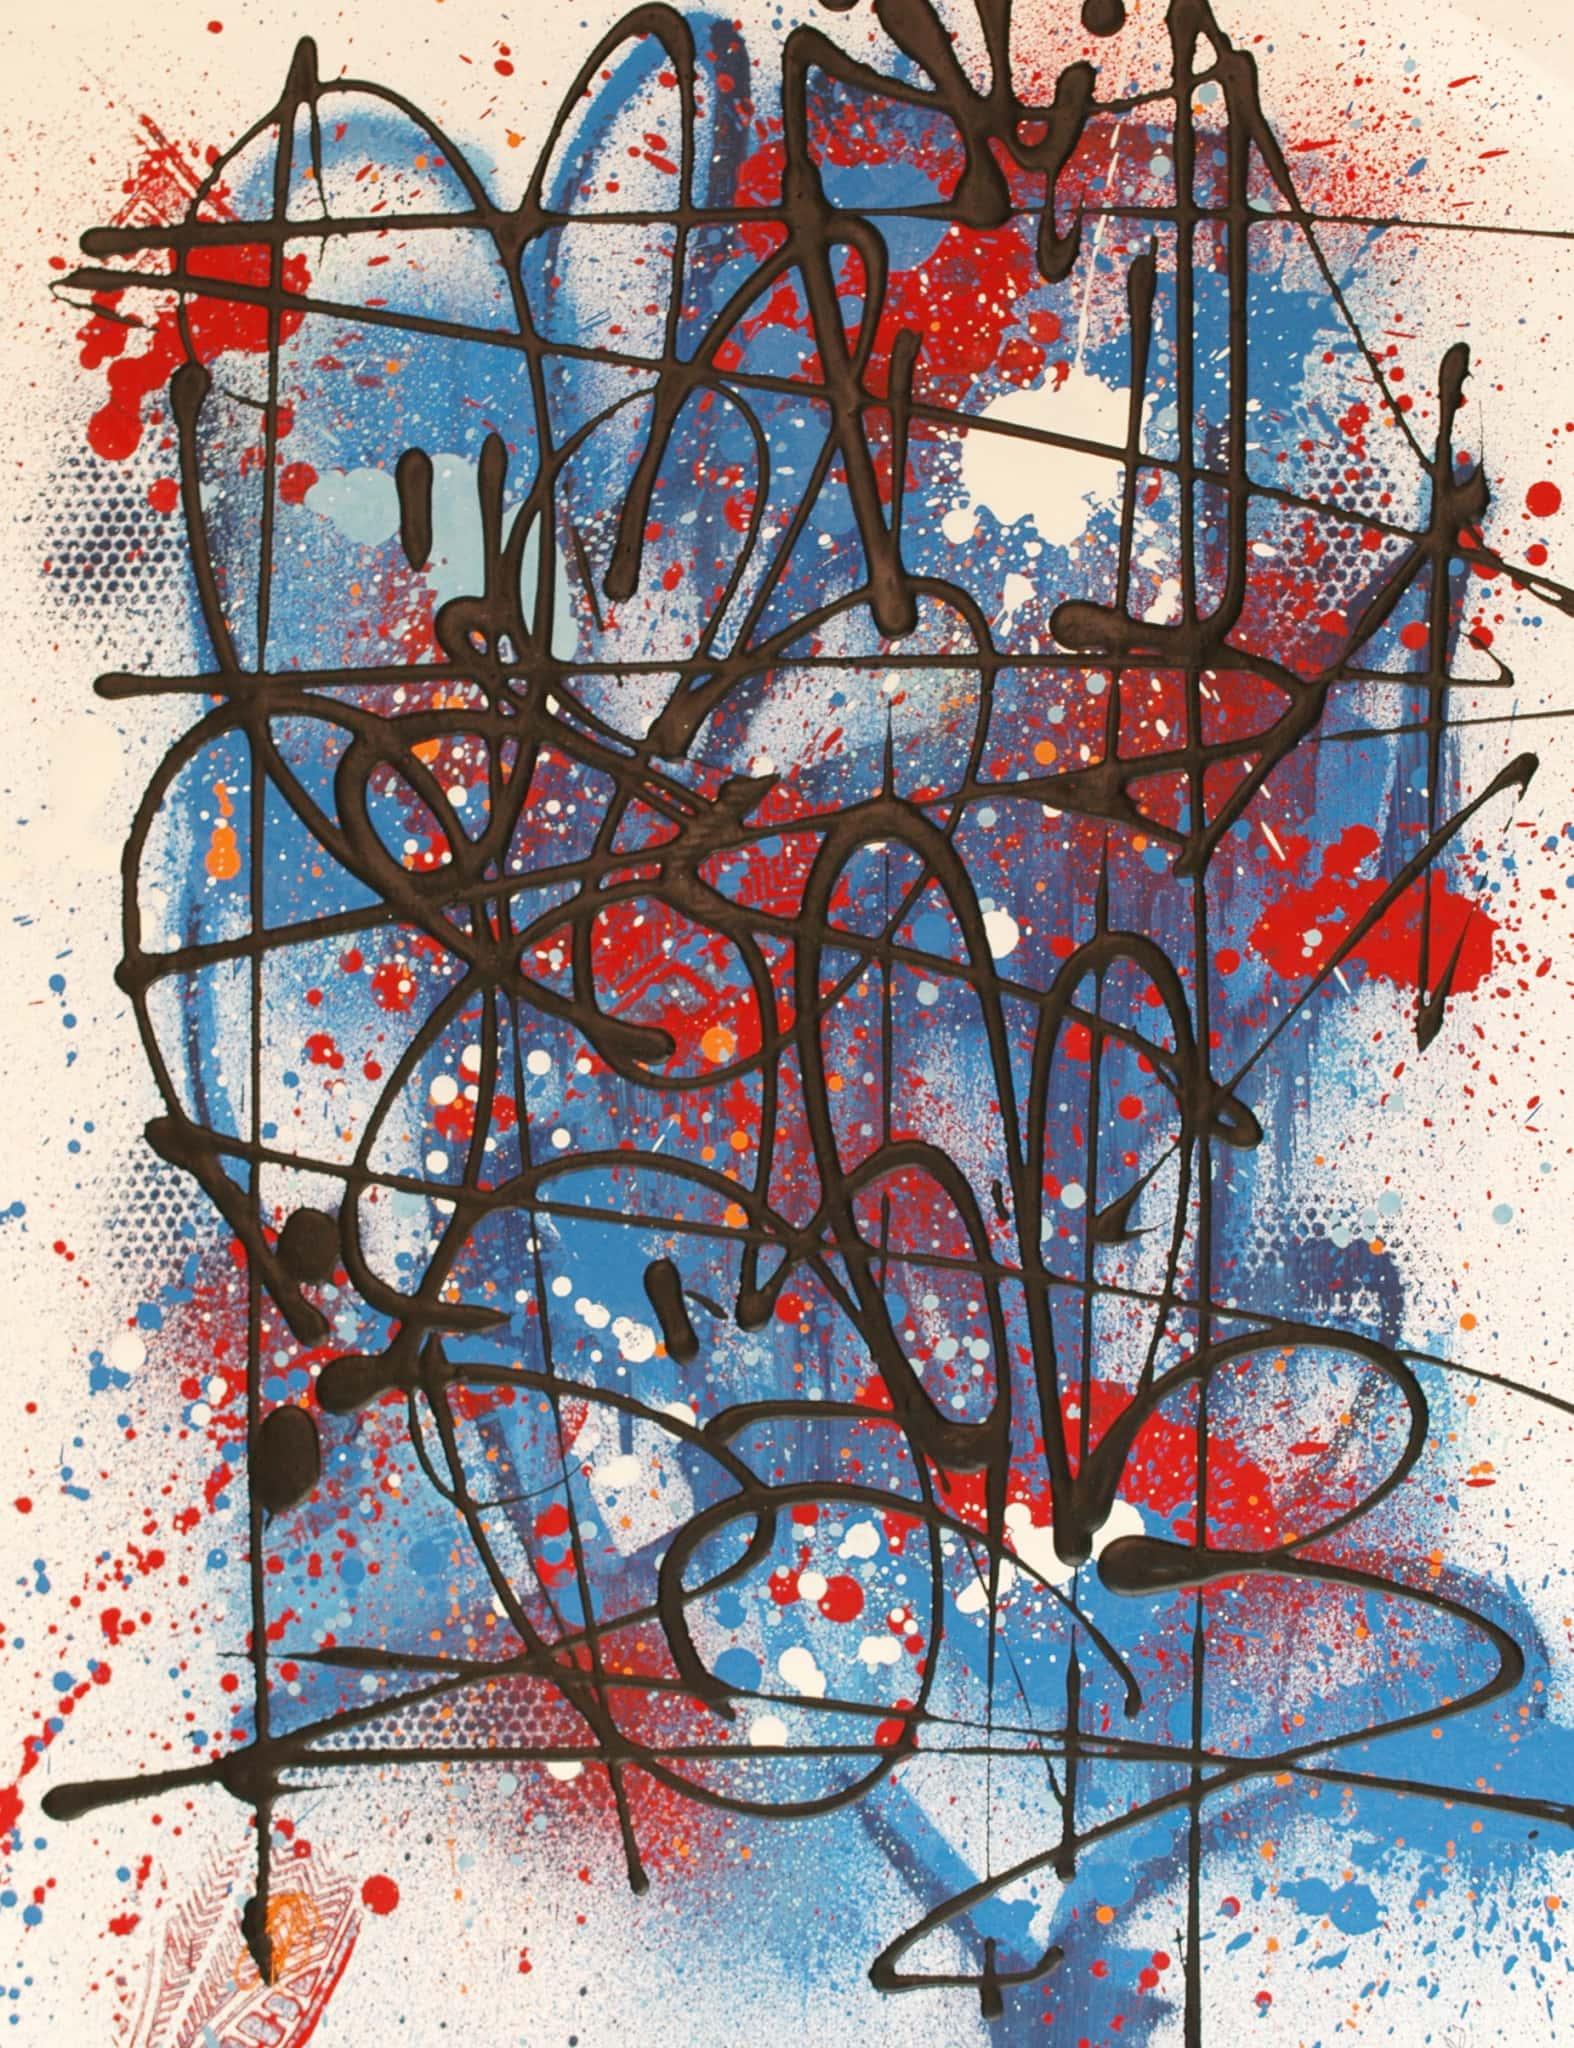 Galerie Art Jingle NEBAY (Réf. BC01) 65x50 cm 2021